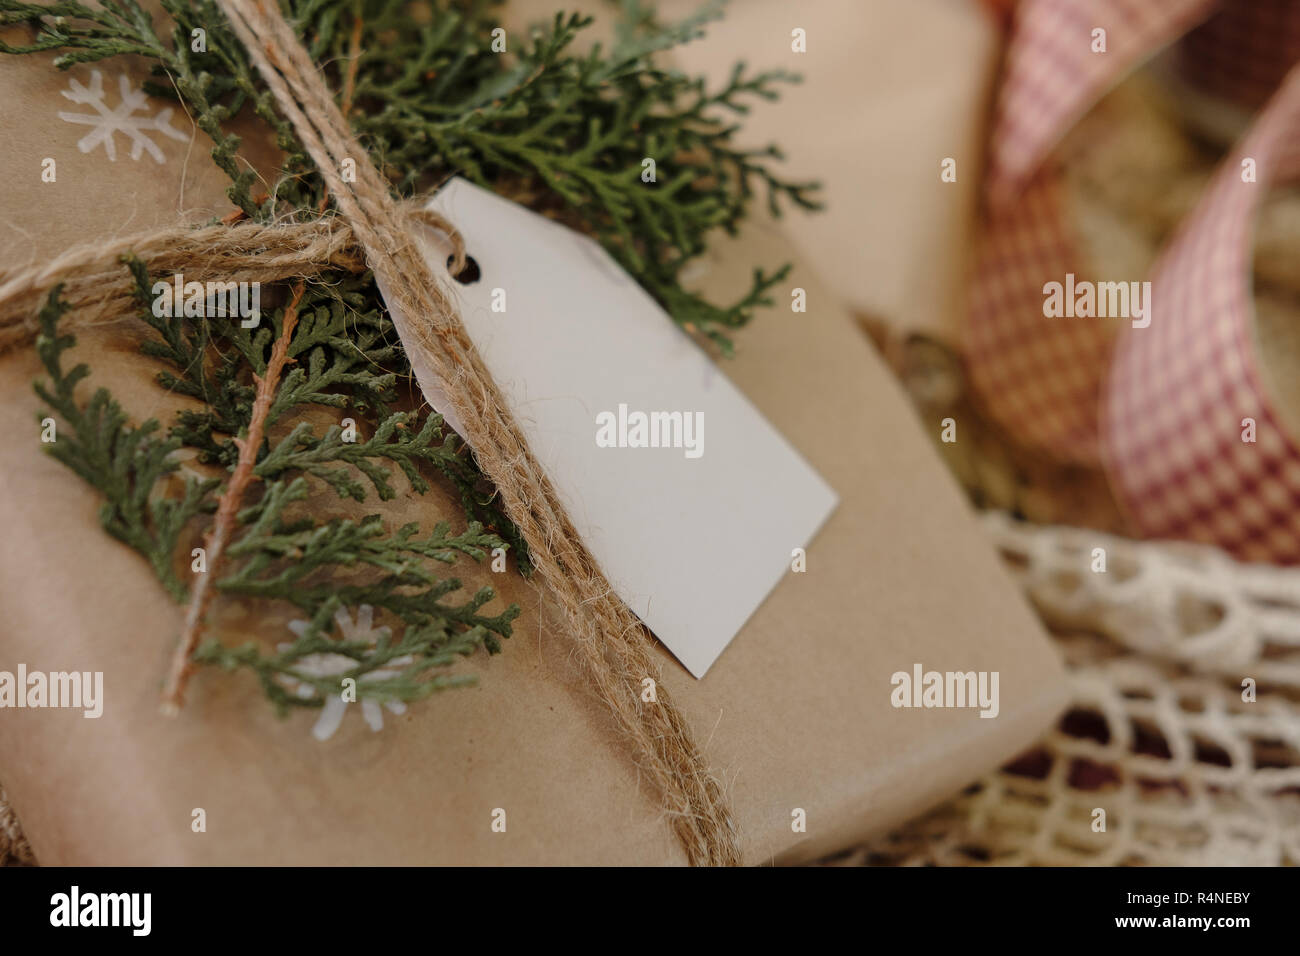 Klassische Weihnachtsgeschenke.Leere Geschenkanhänger Auf Klassische Vintage Christmas Gift Box